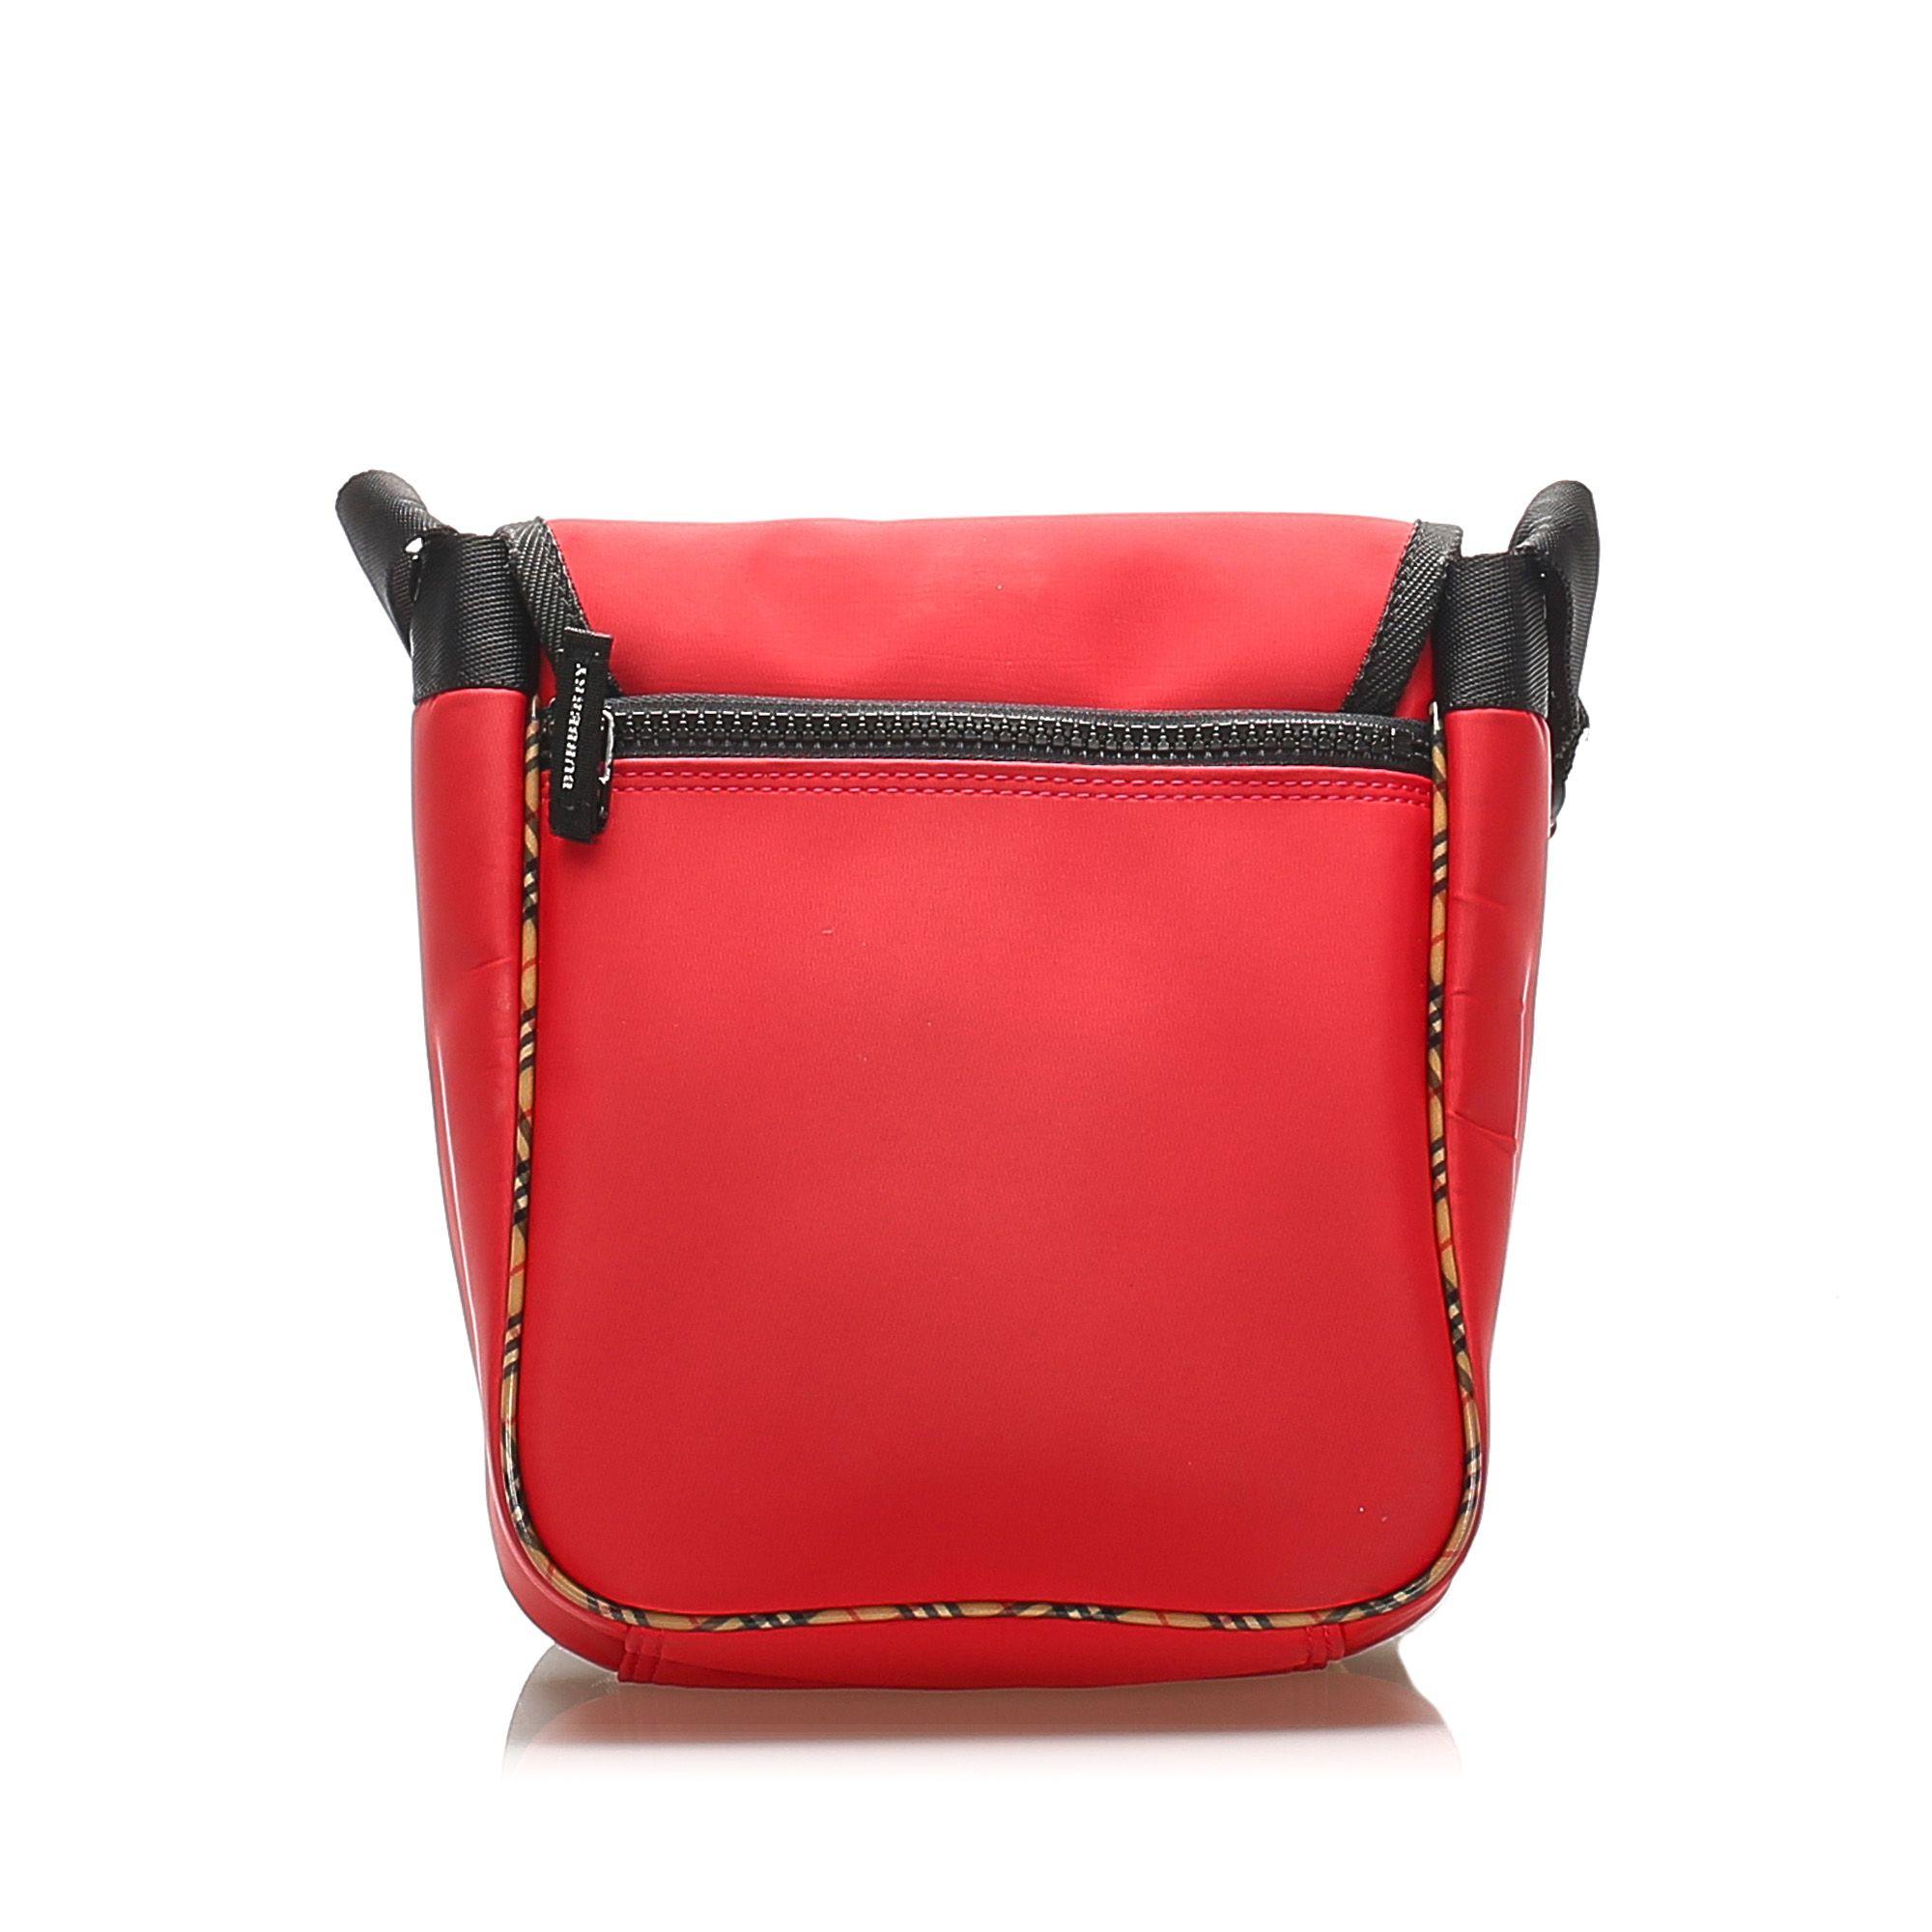 Vintage Burberry Nova Check Leather Crossbody Bag Red